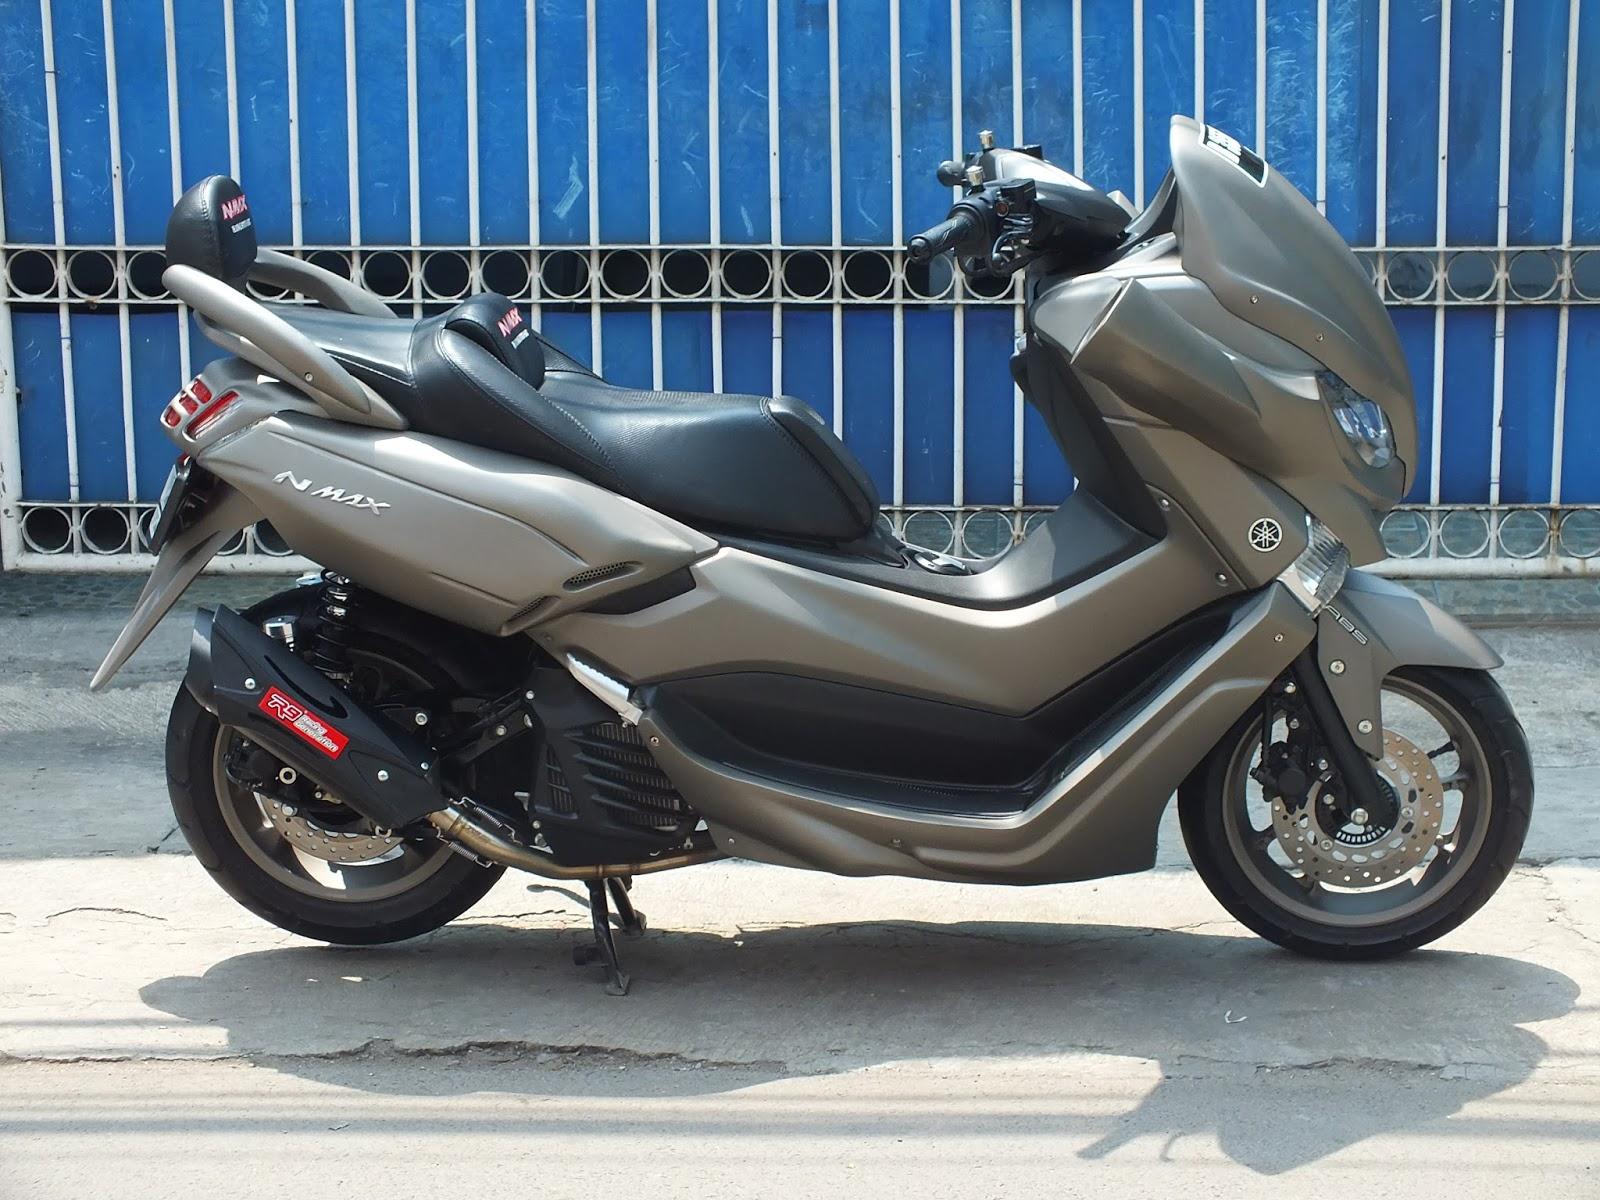 Modifikasi Jok Motor Jok Yamaha Nmax Model Majesty